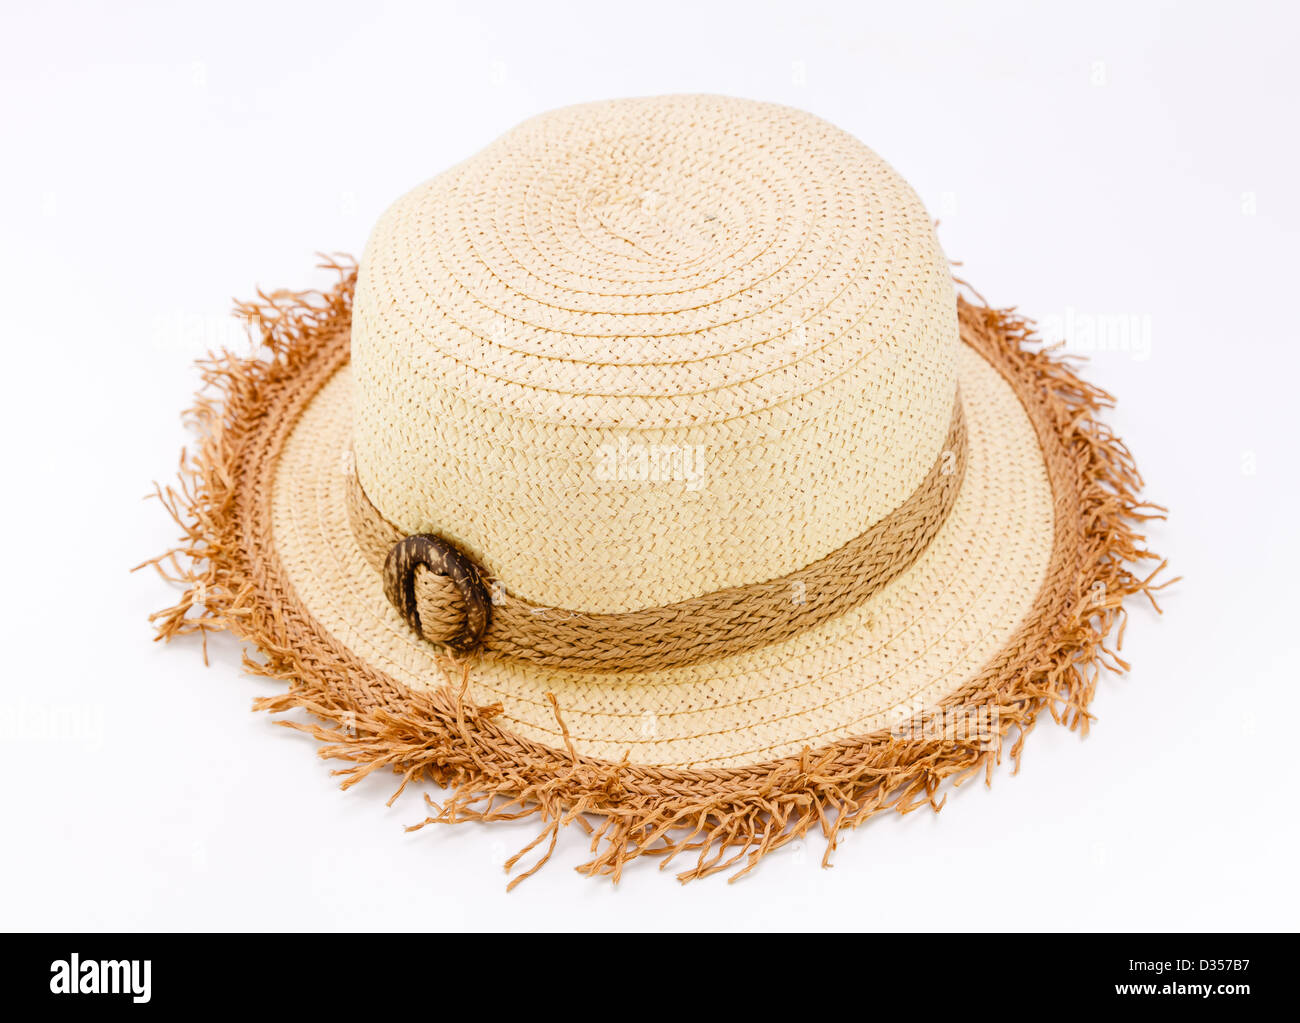 Female woven fashion hat isolate on white background - Stock Image